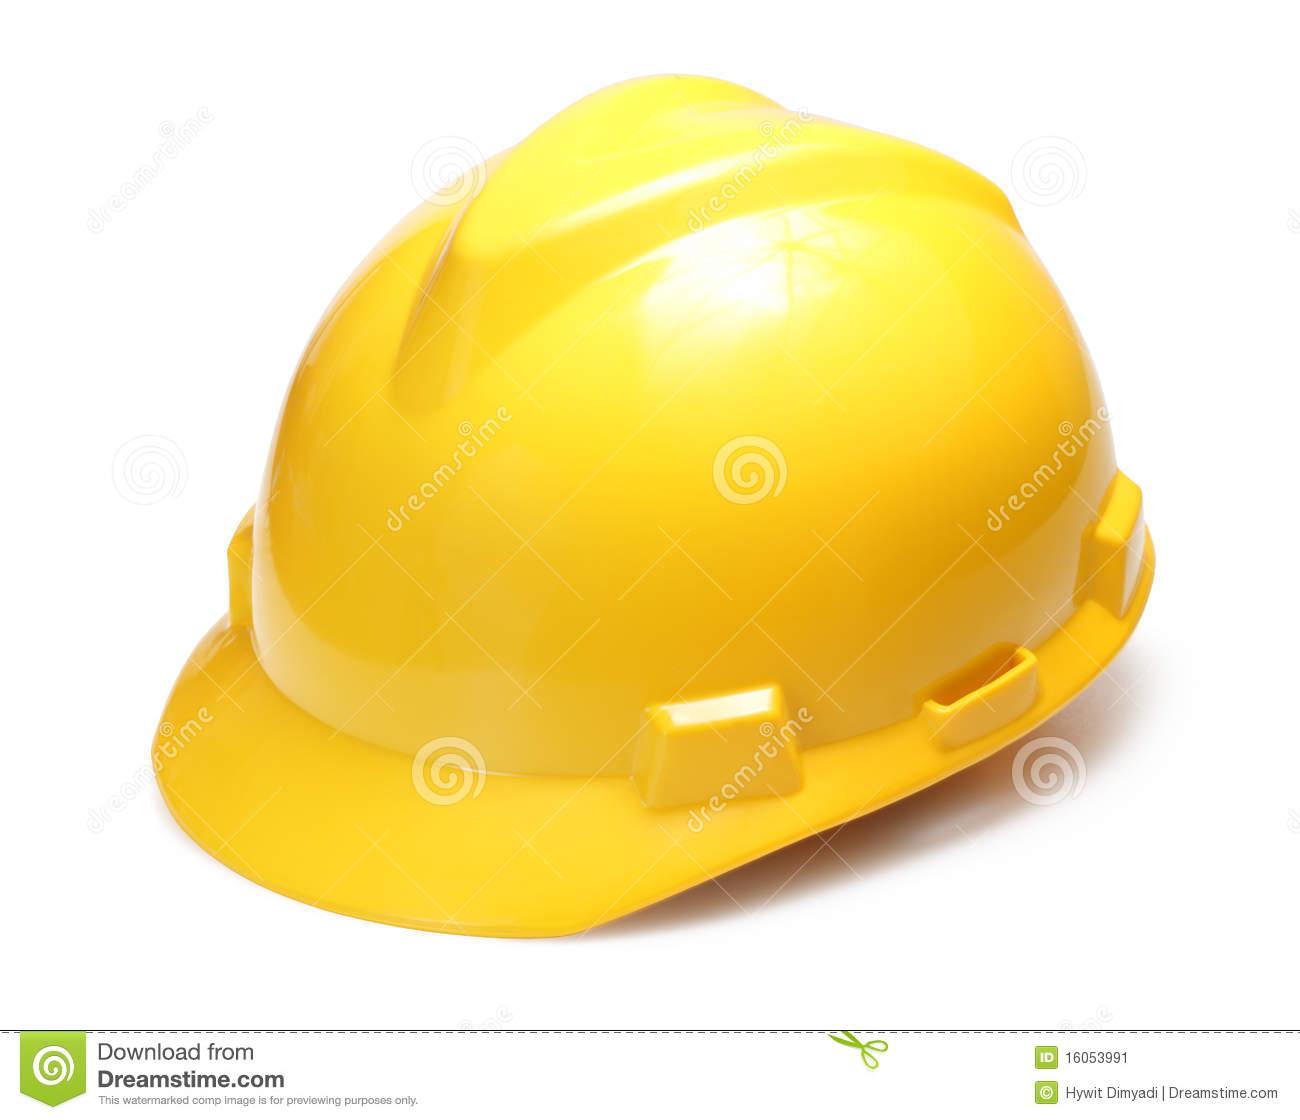 yellow hard hat clipart - photo #41